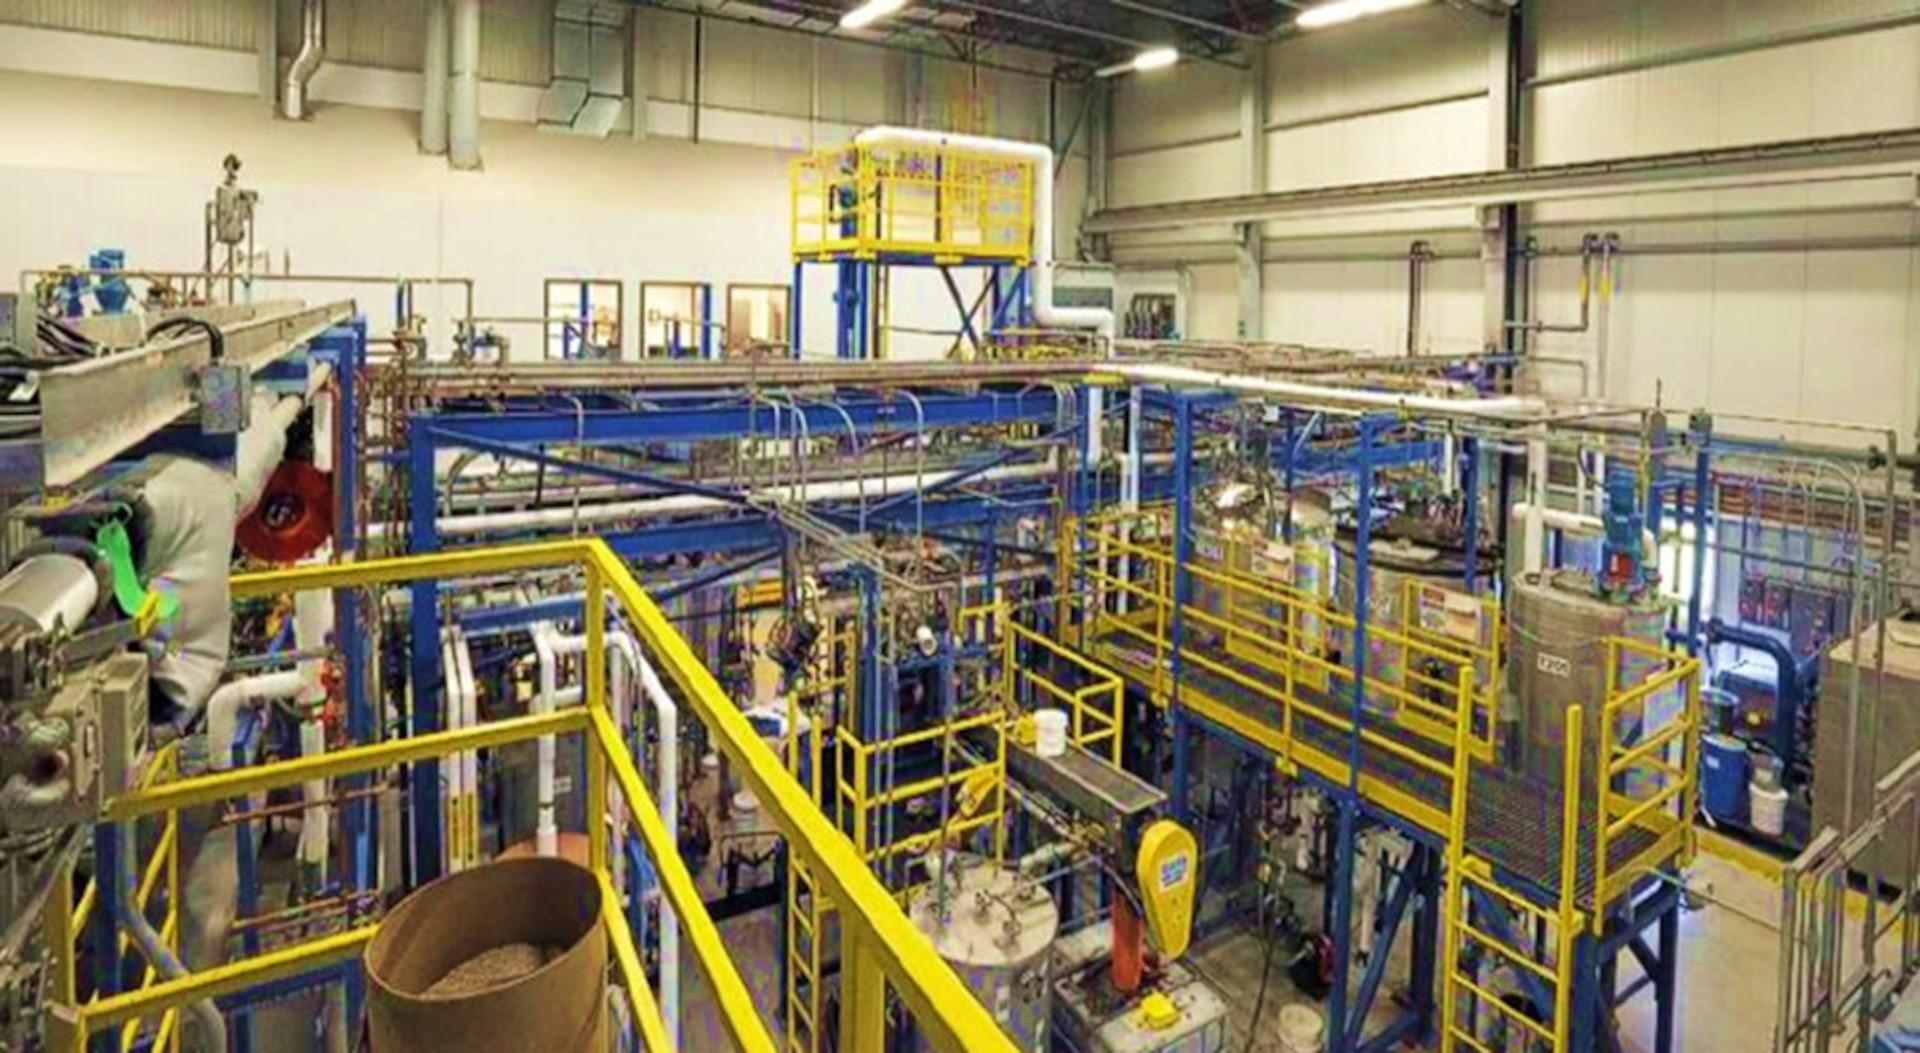 University of Maine's Biomass to Bio-products Pilot Plant